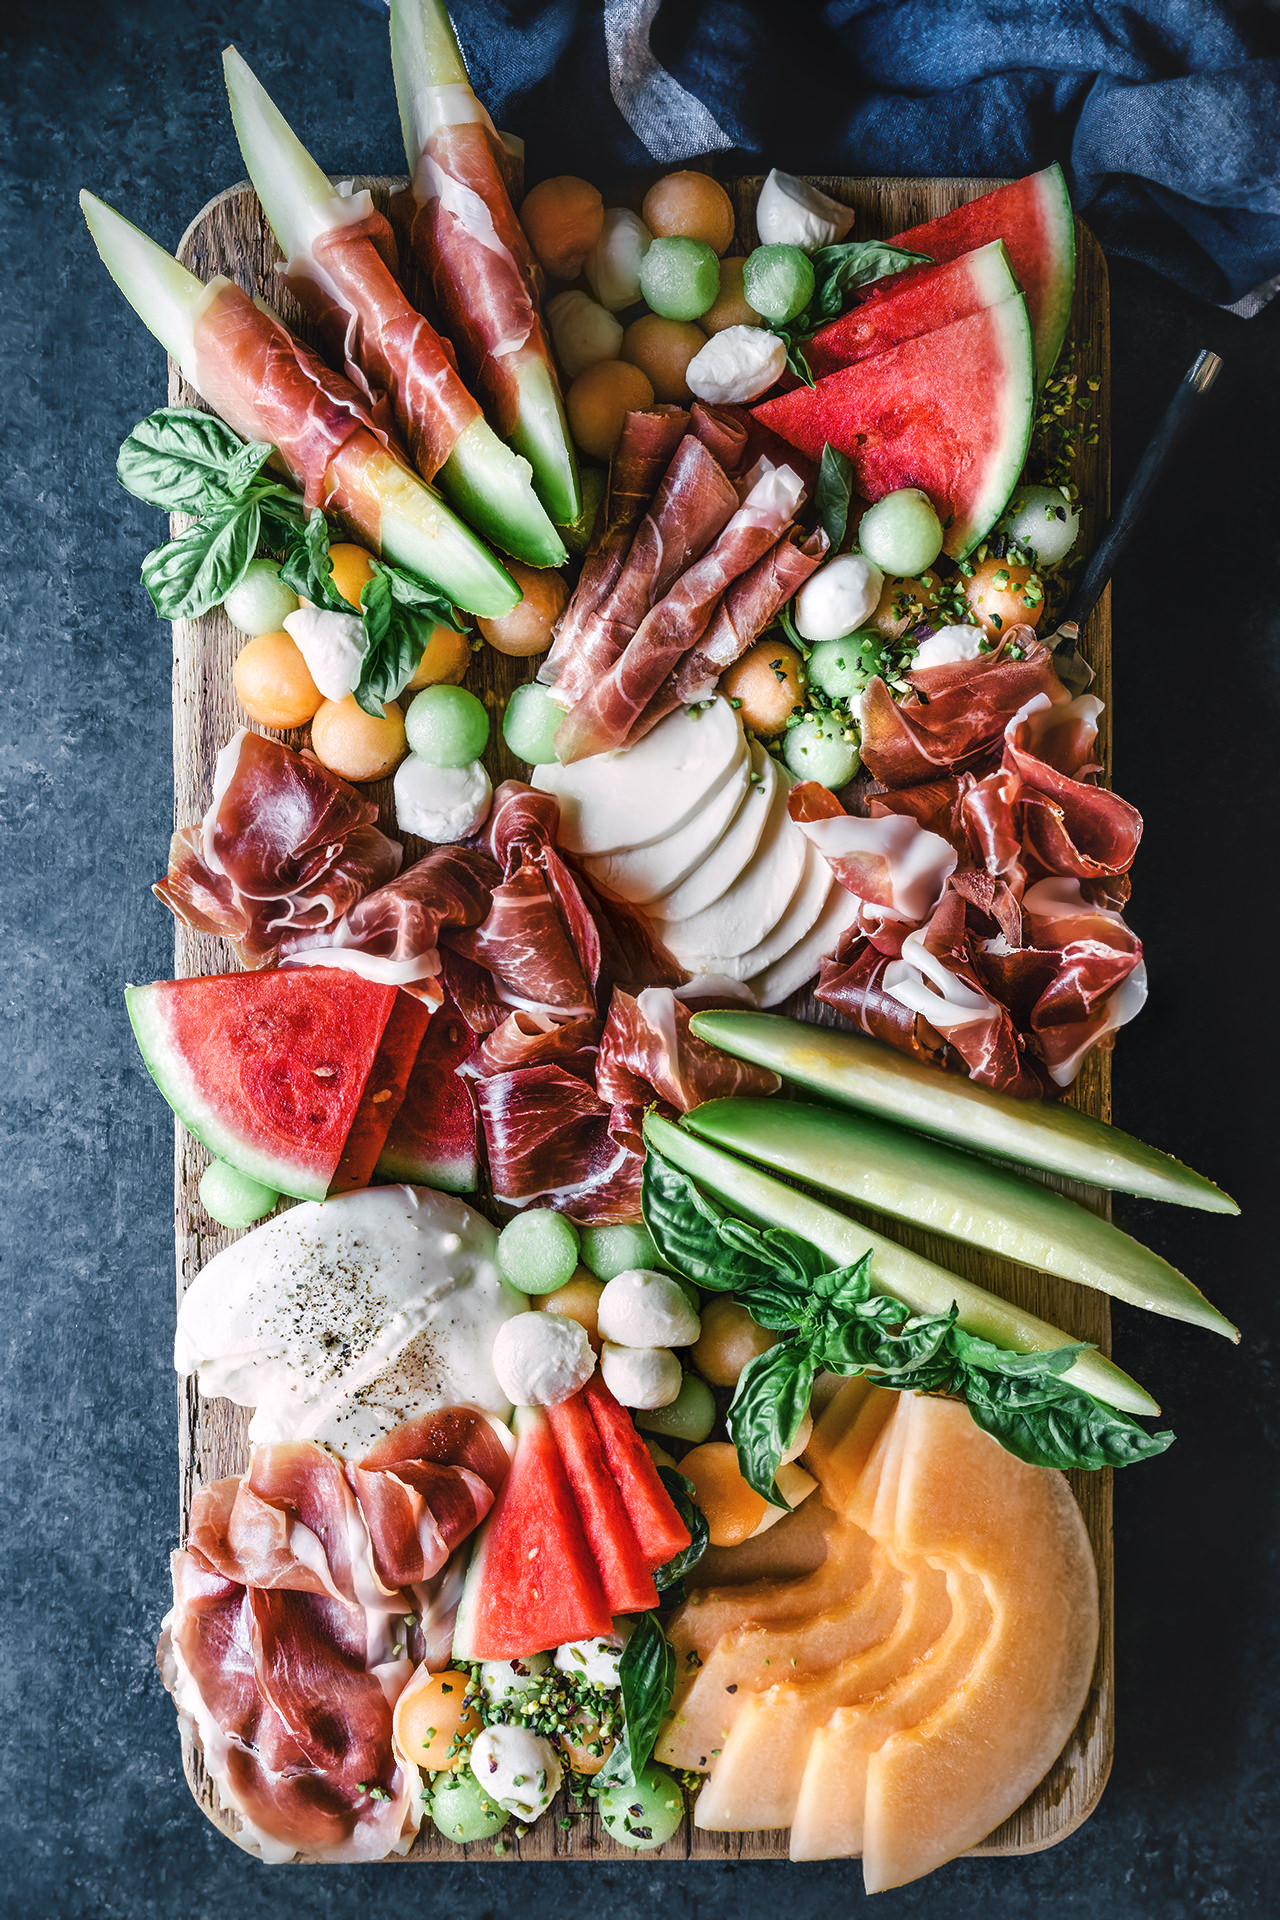 melon.and.charcuterie.platter.5496.6-1.jpg